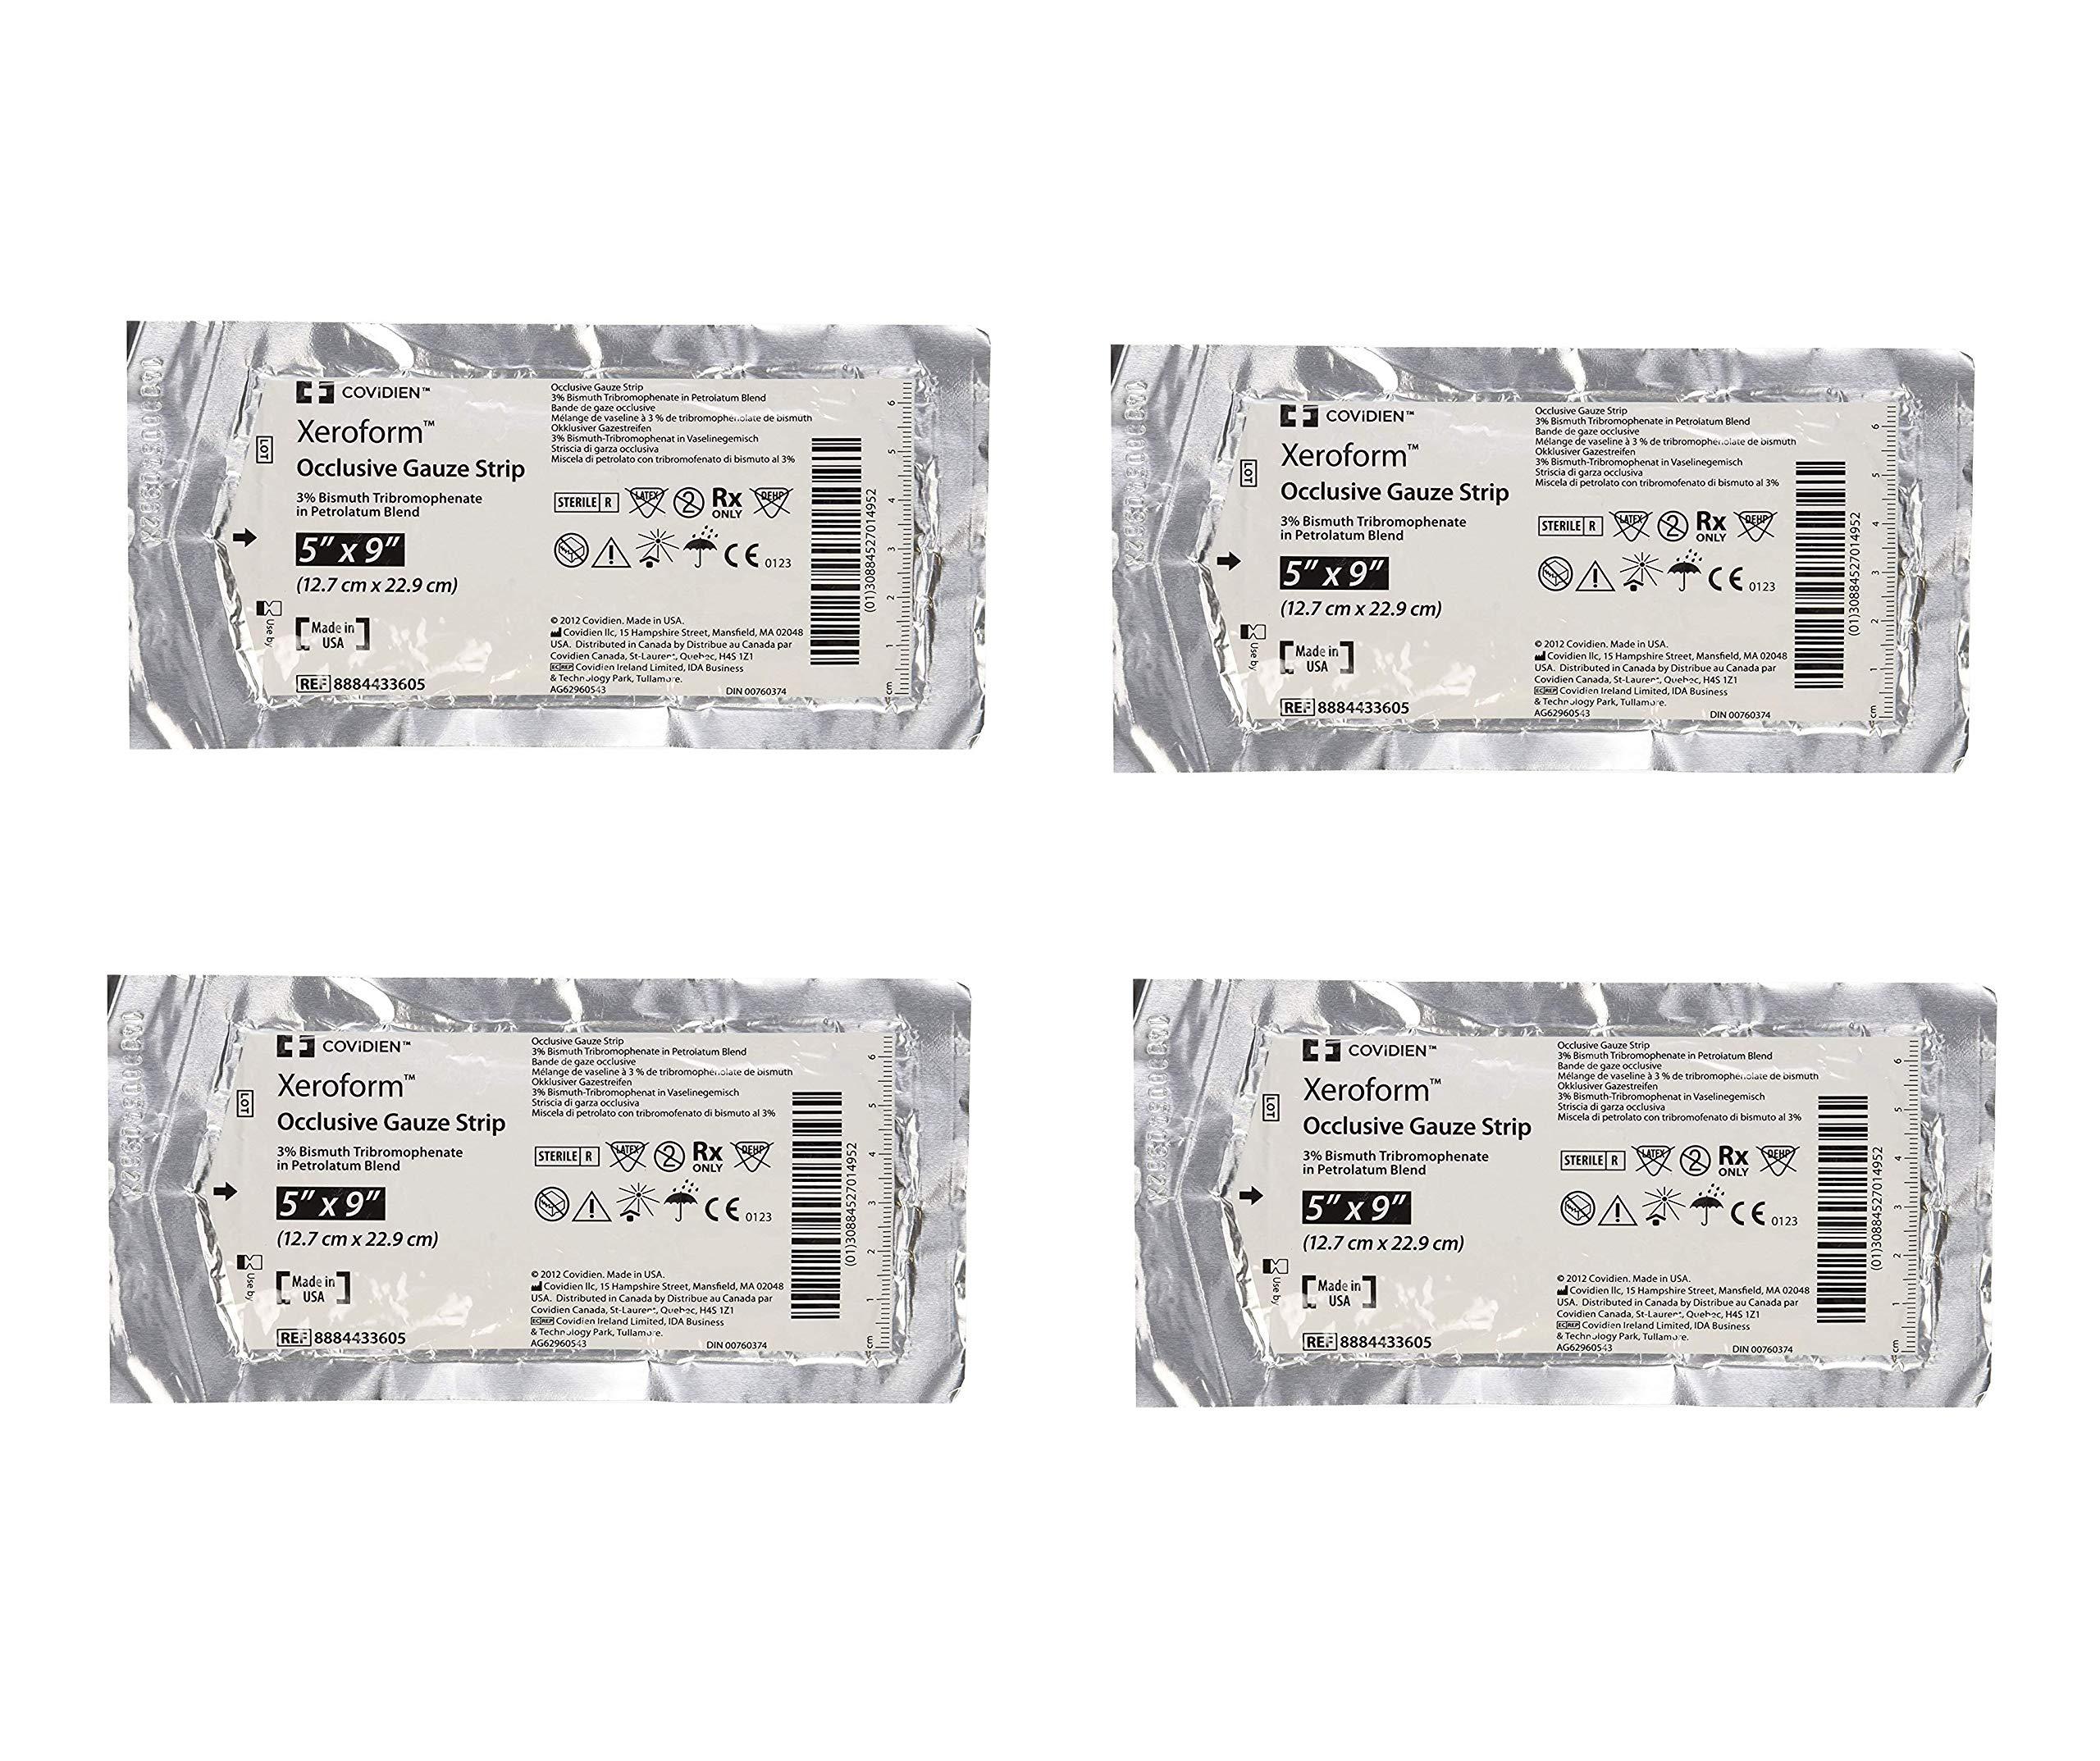 DSS Xeroform Occlusive Petrolatum Gauze Strip, 5'' X 9'', 50 Count (4 Pack)